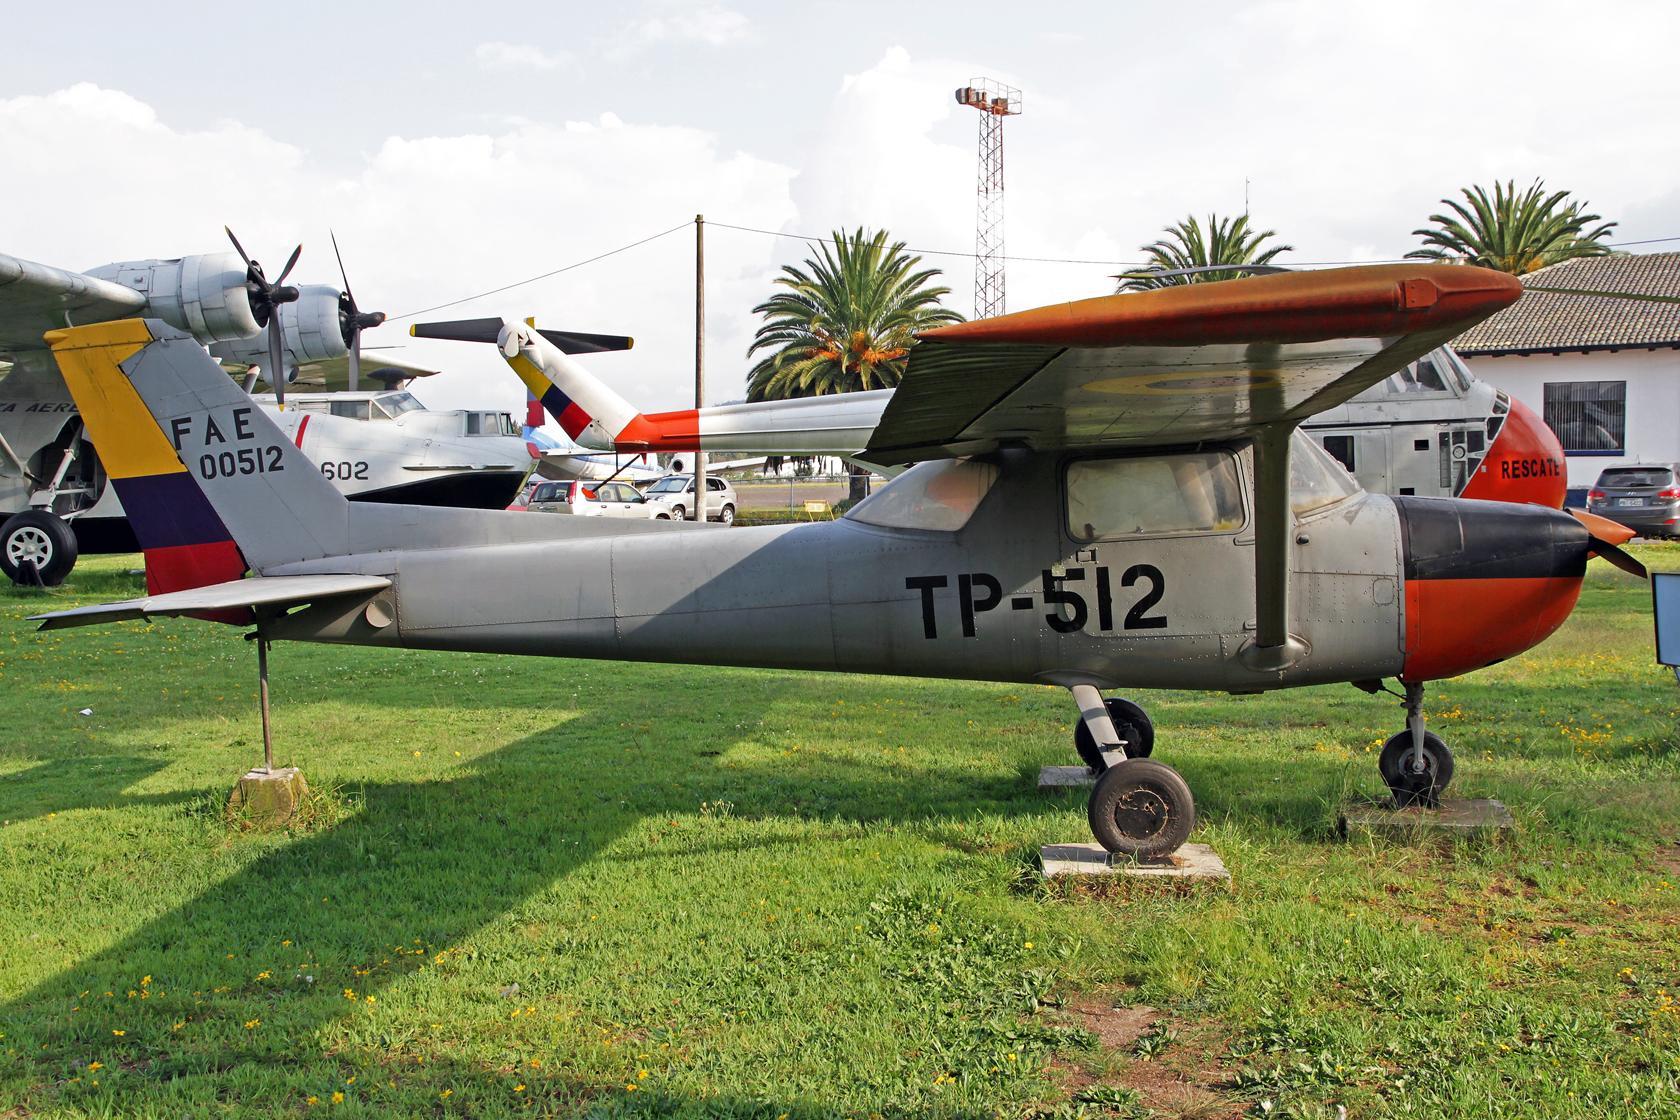 Fuerza Aérea Ecuatoriana Cessna 150L FAE-00512